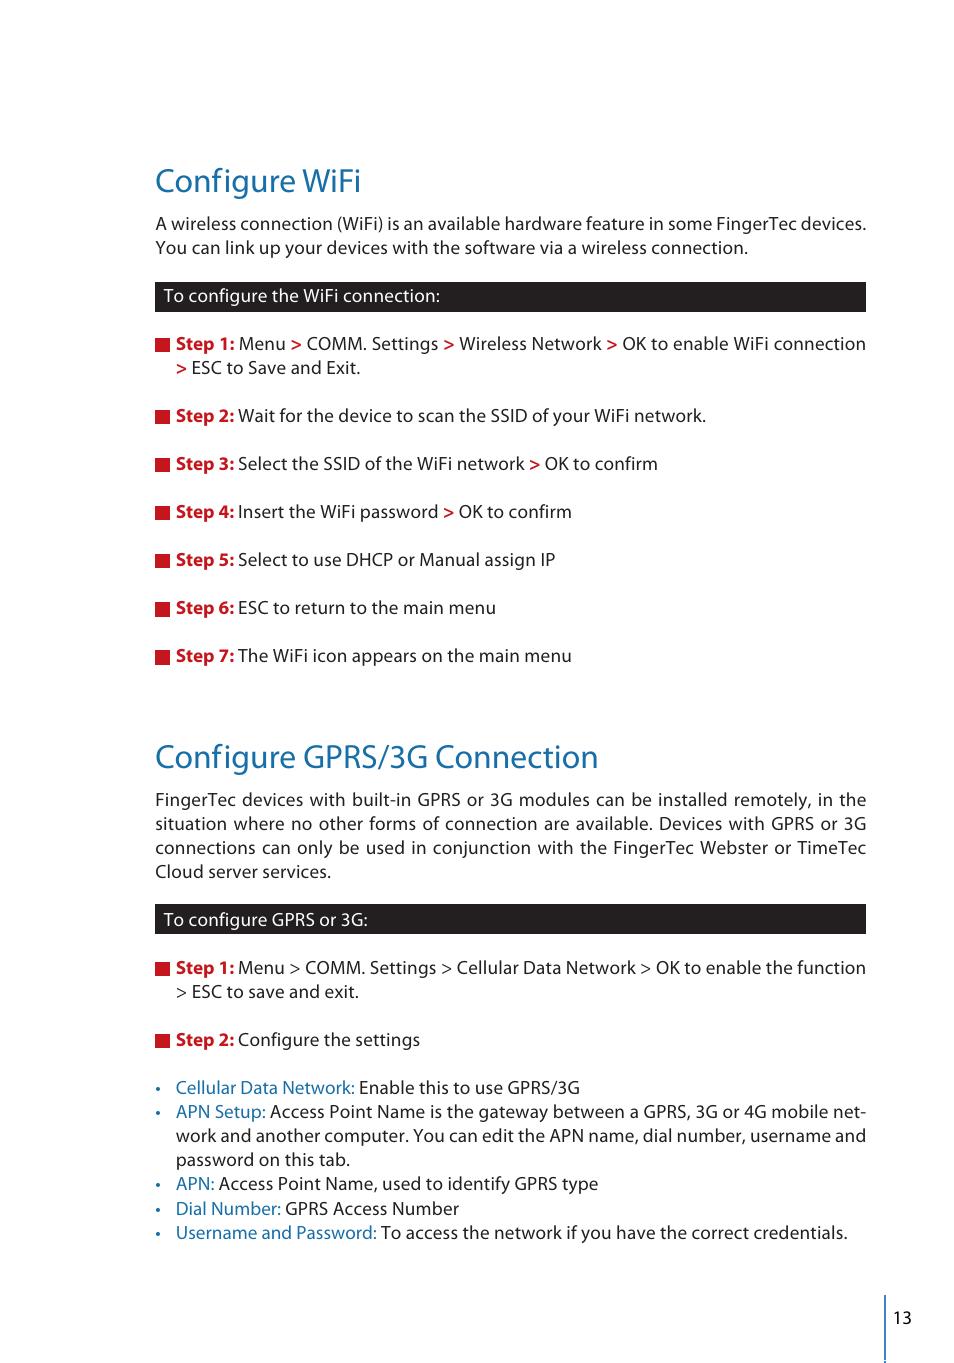 Conf, Igure wifi, Igure gprs/3g connection | FingerTec FMM